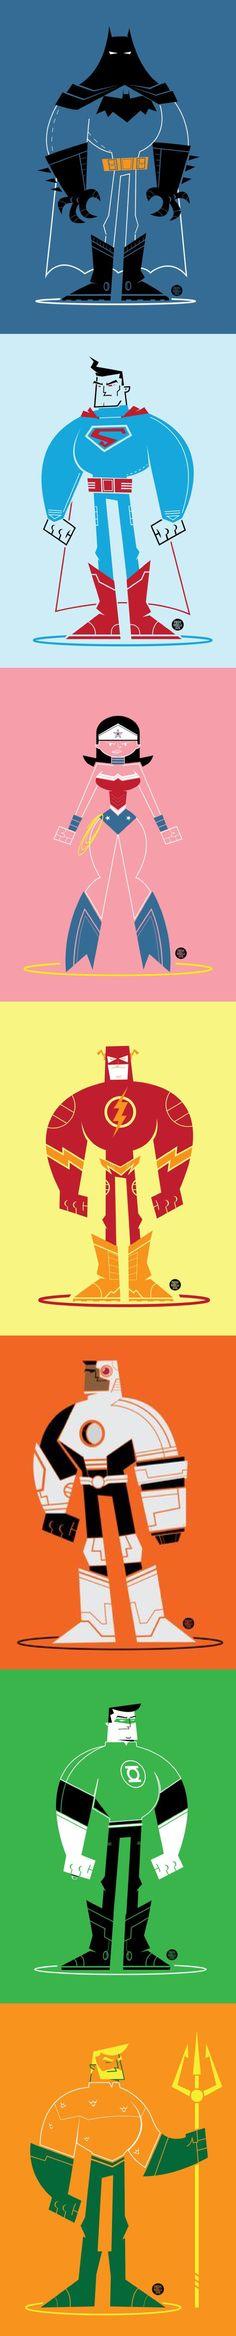 Justice League of America - Vector Art